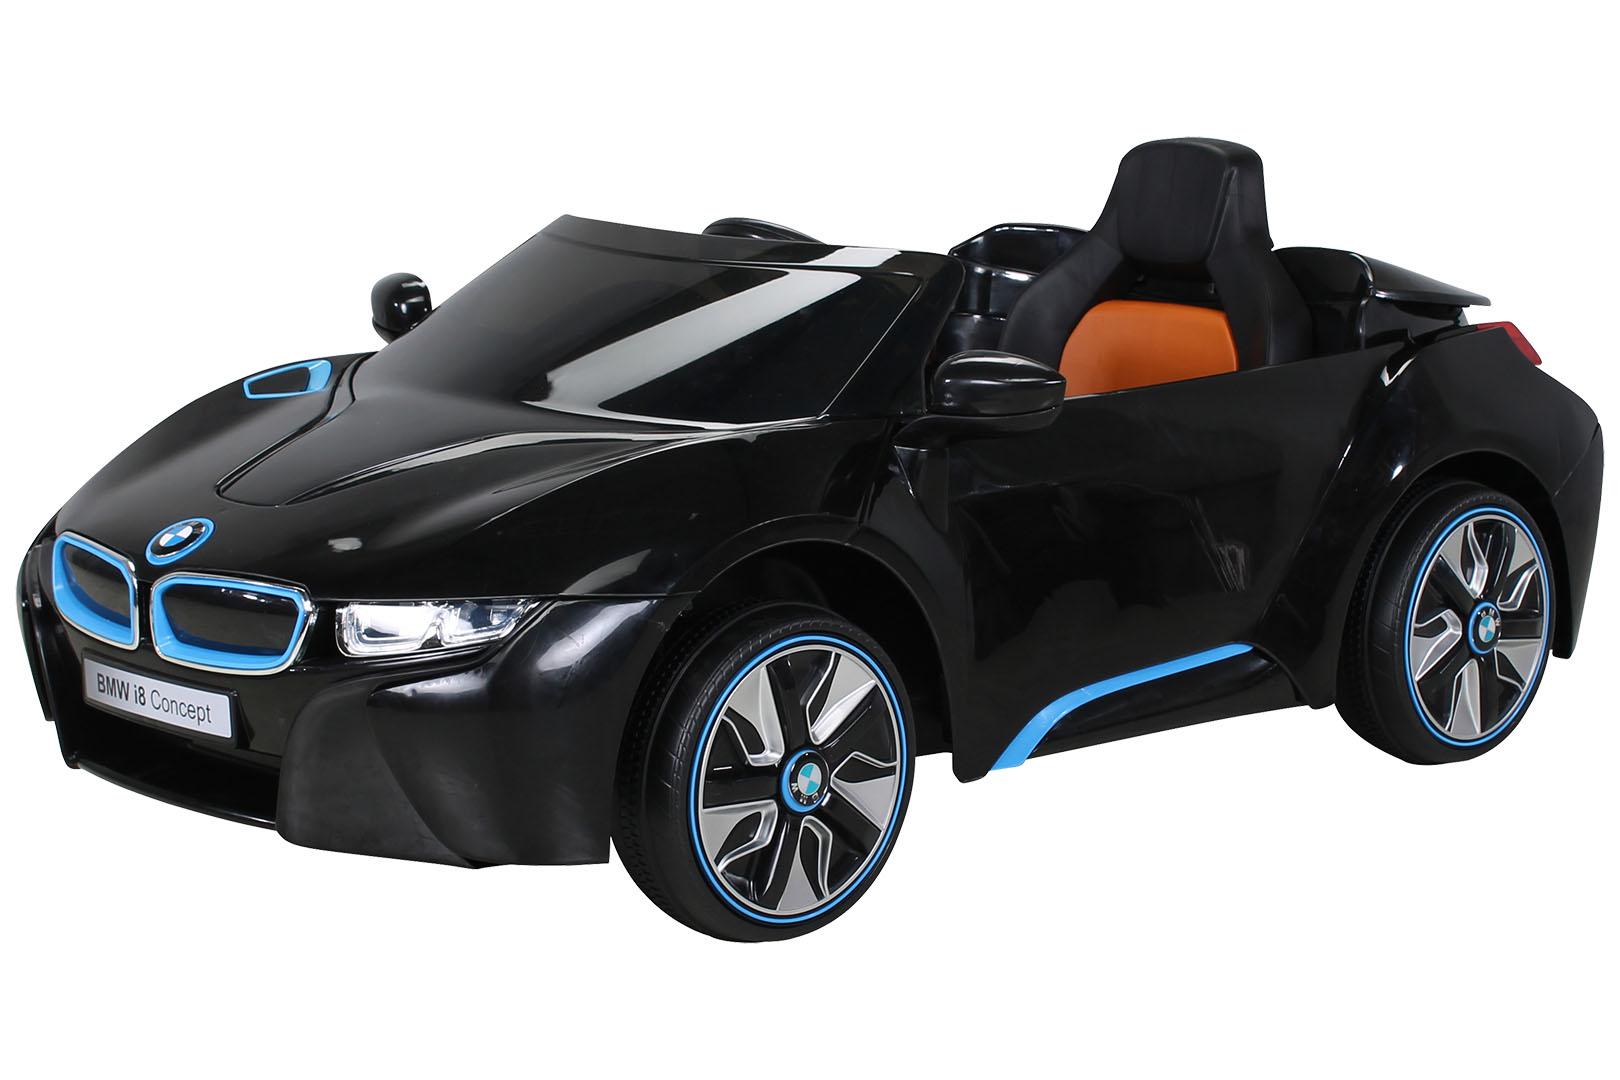 Kinder Elektroauto Bmw : kinder elektroauto bmw i8 lizenziert 2x 45 watt motor 2x 6v 7ah batterie ~ A.2002-acura-tl-radio.info Haus und Dekorationen